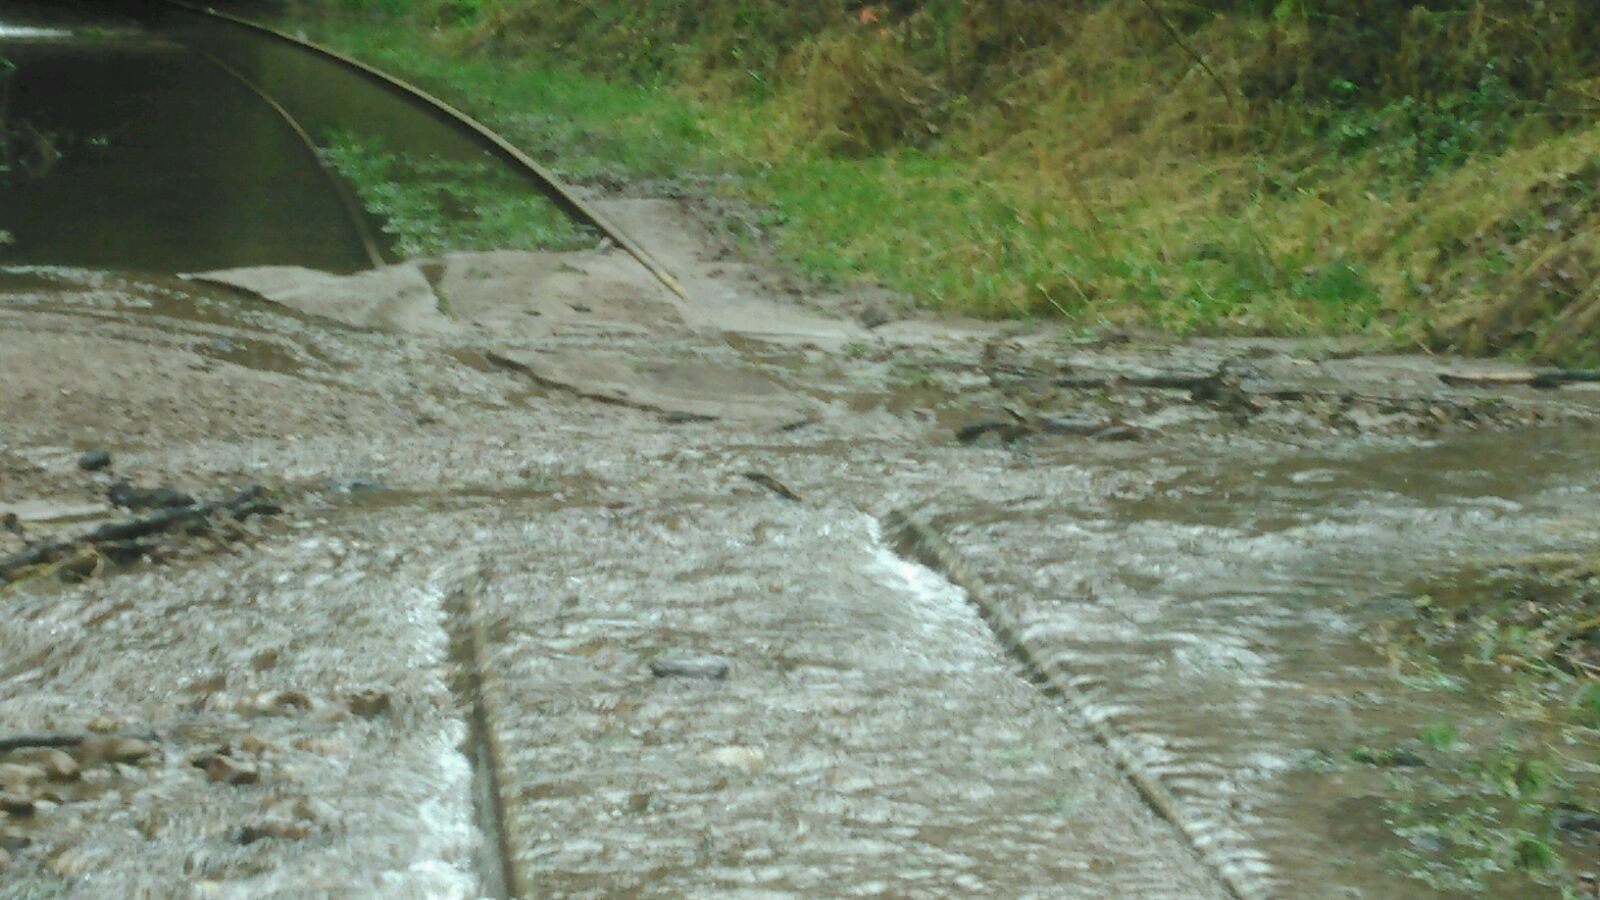 Drainage CONditions - North portal, TUnnel 19